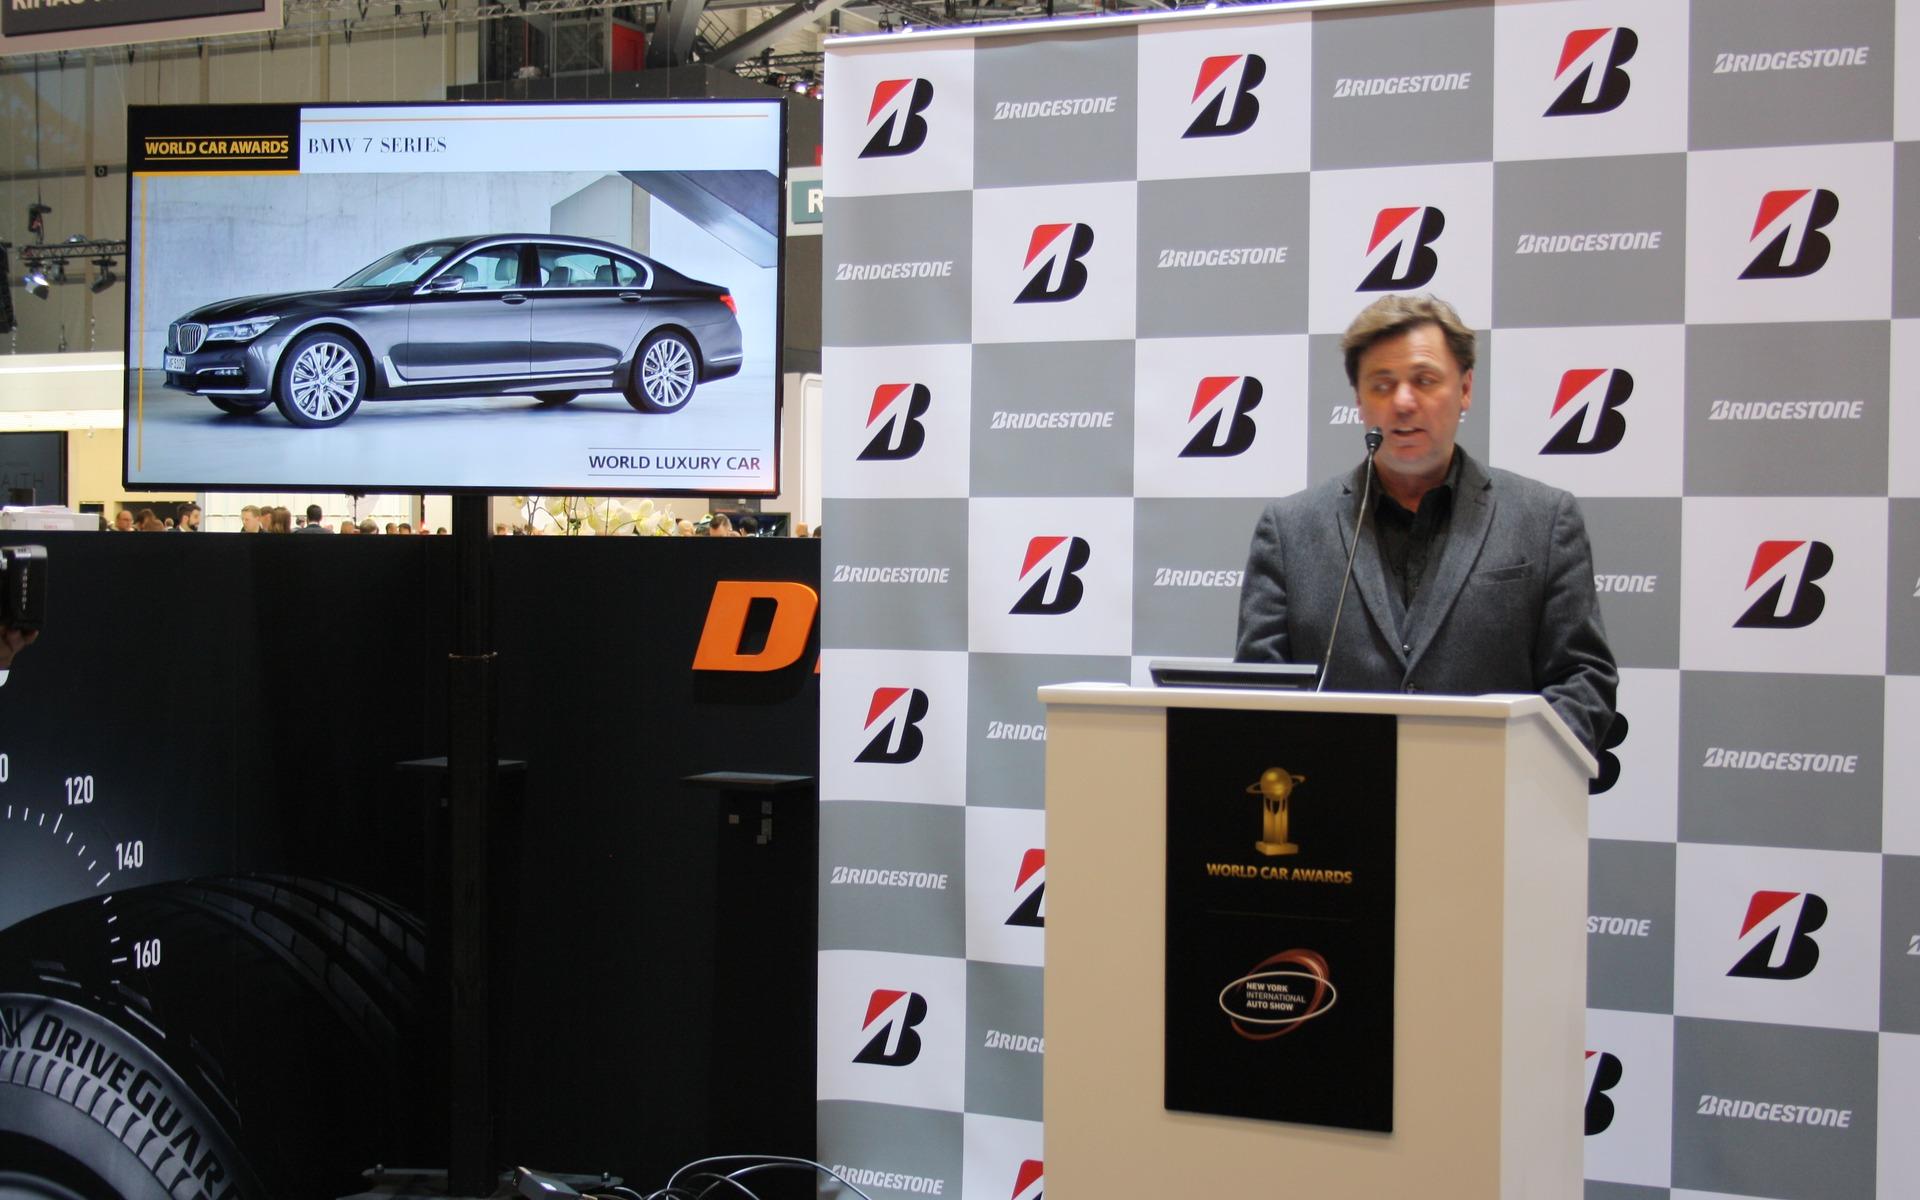 2016 World Luxury Car of the Year finalist: BMW 7 Series